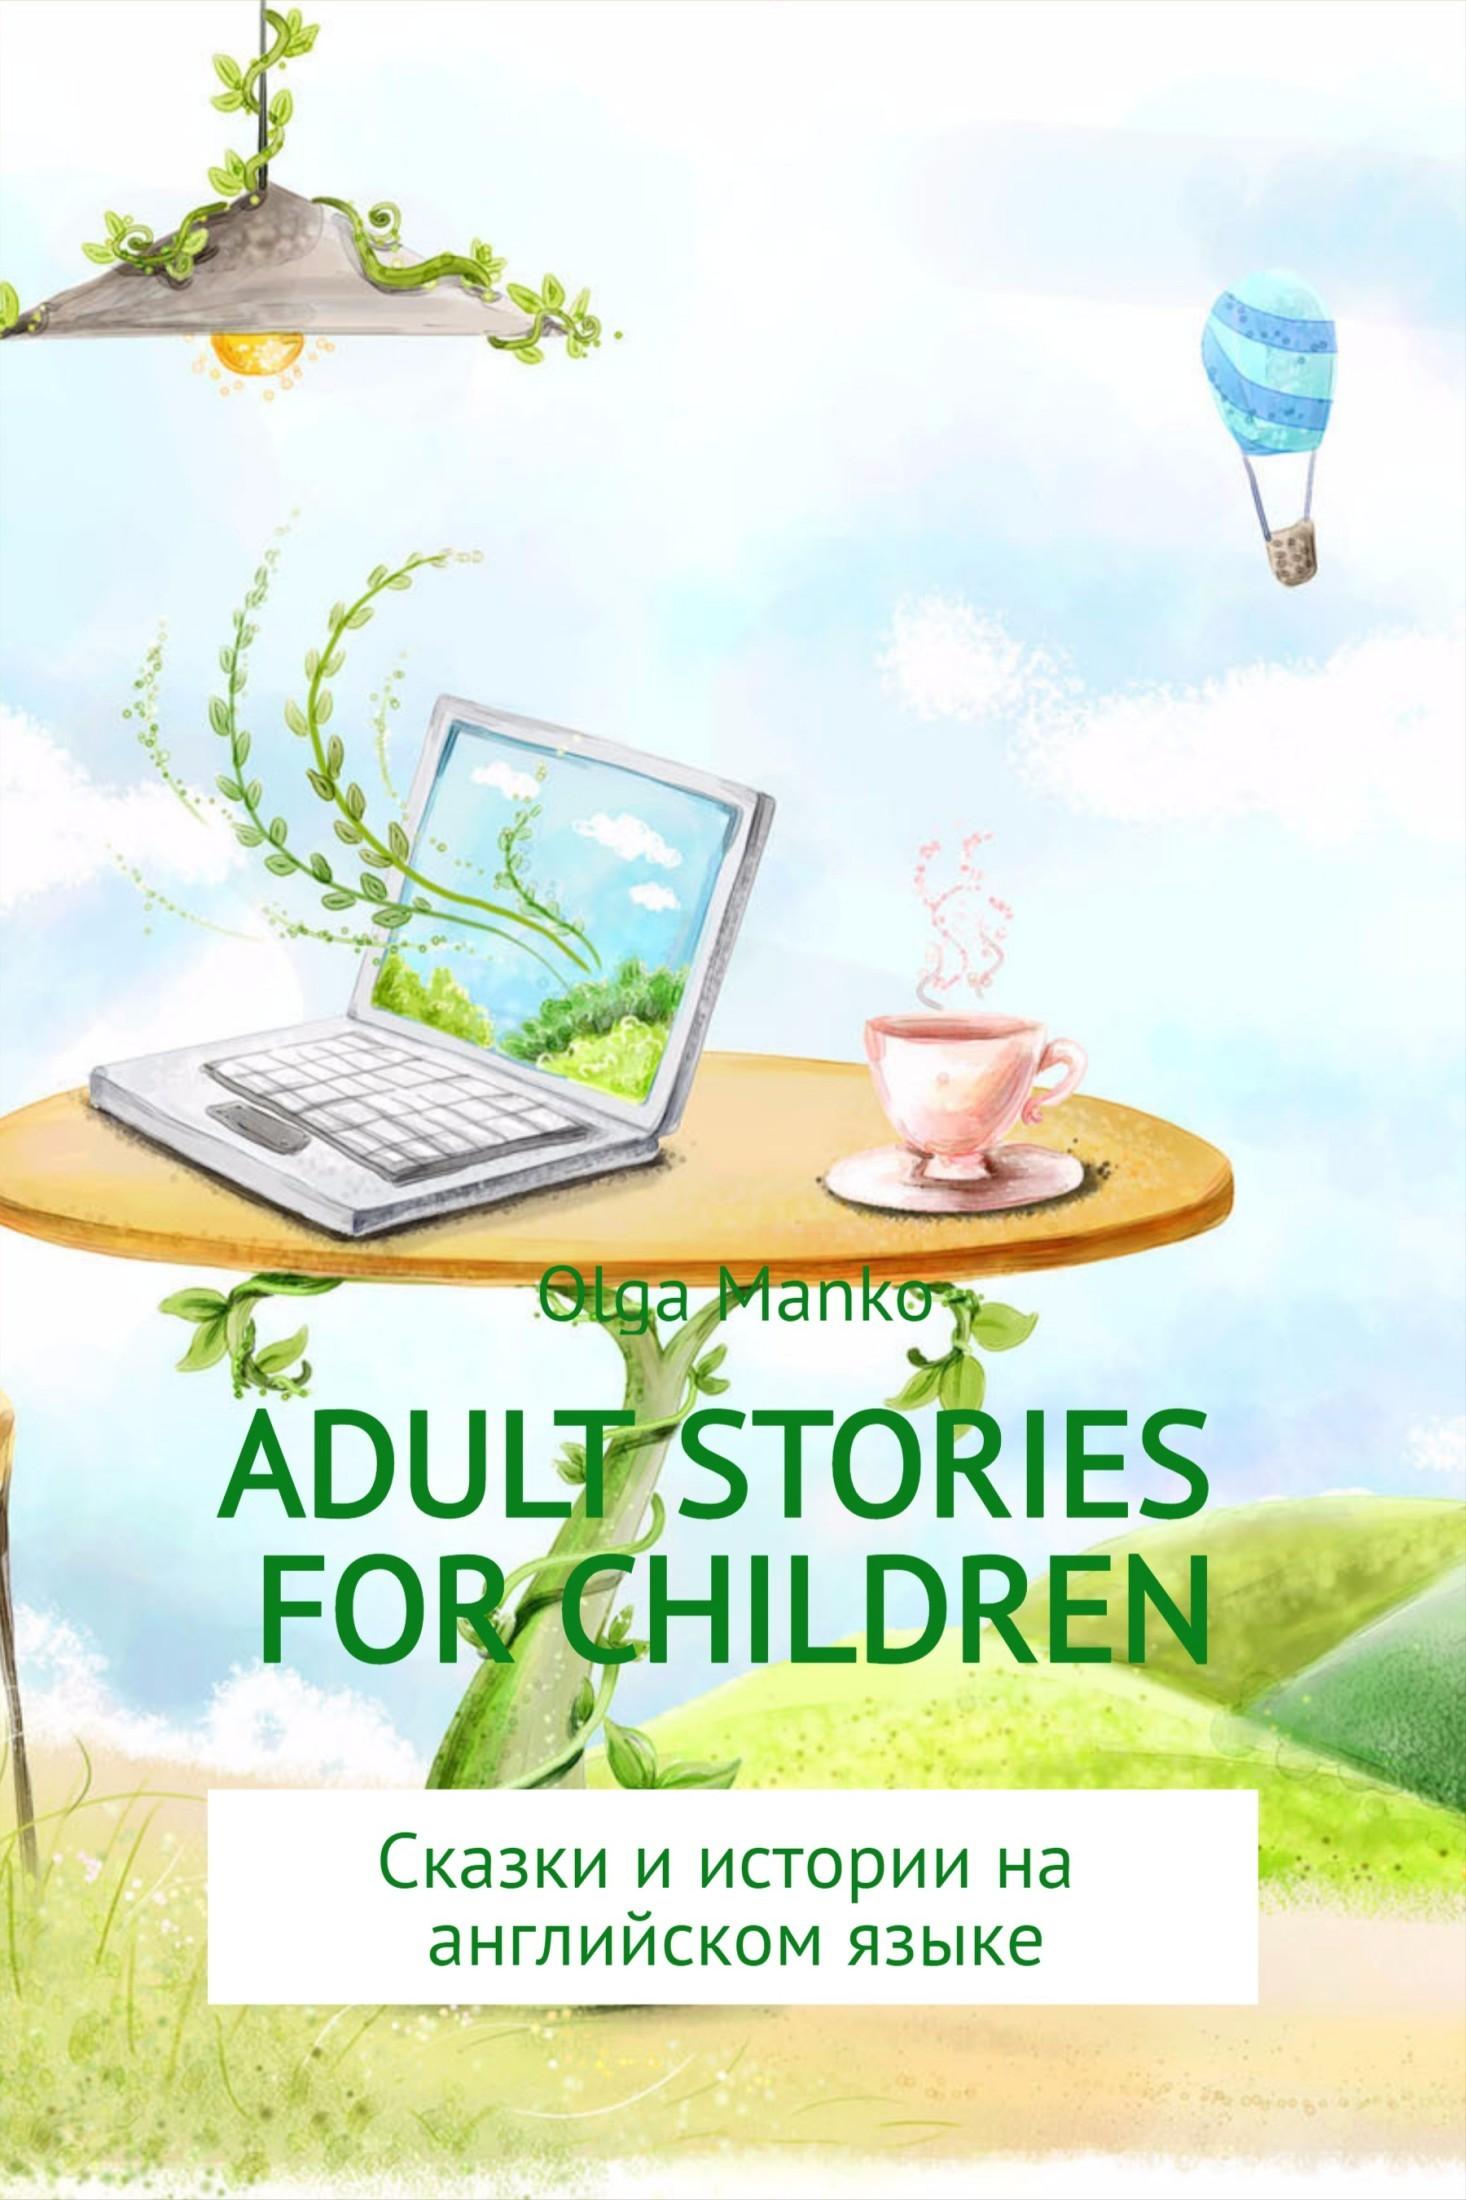 Ольга Владимировна Манько Adult stories for children